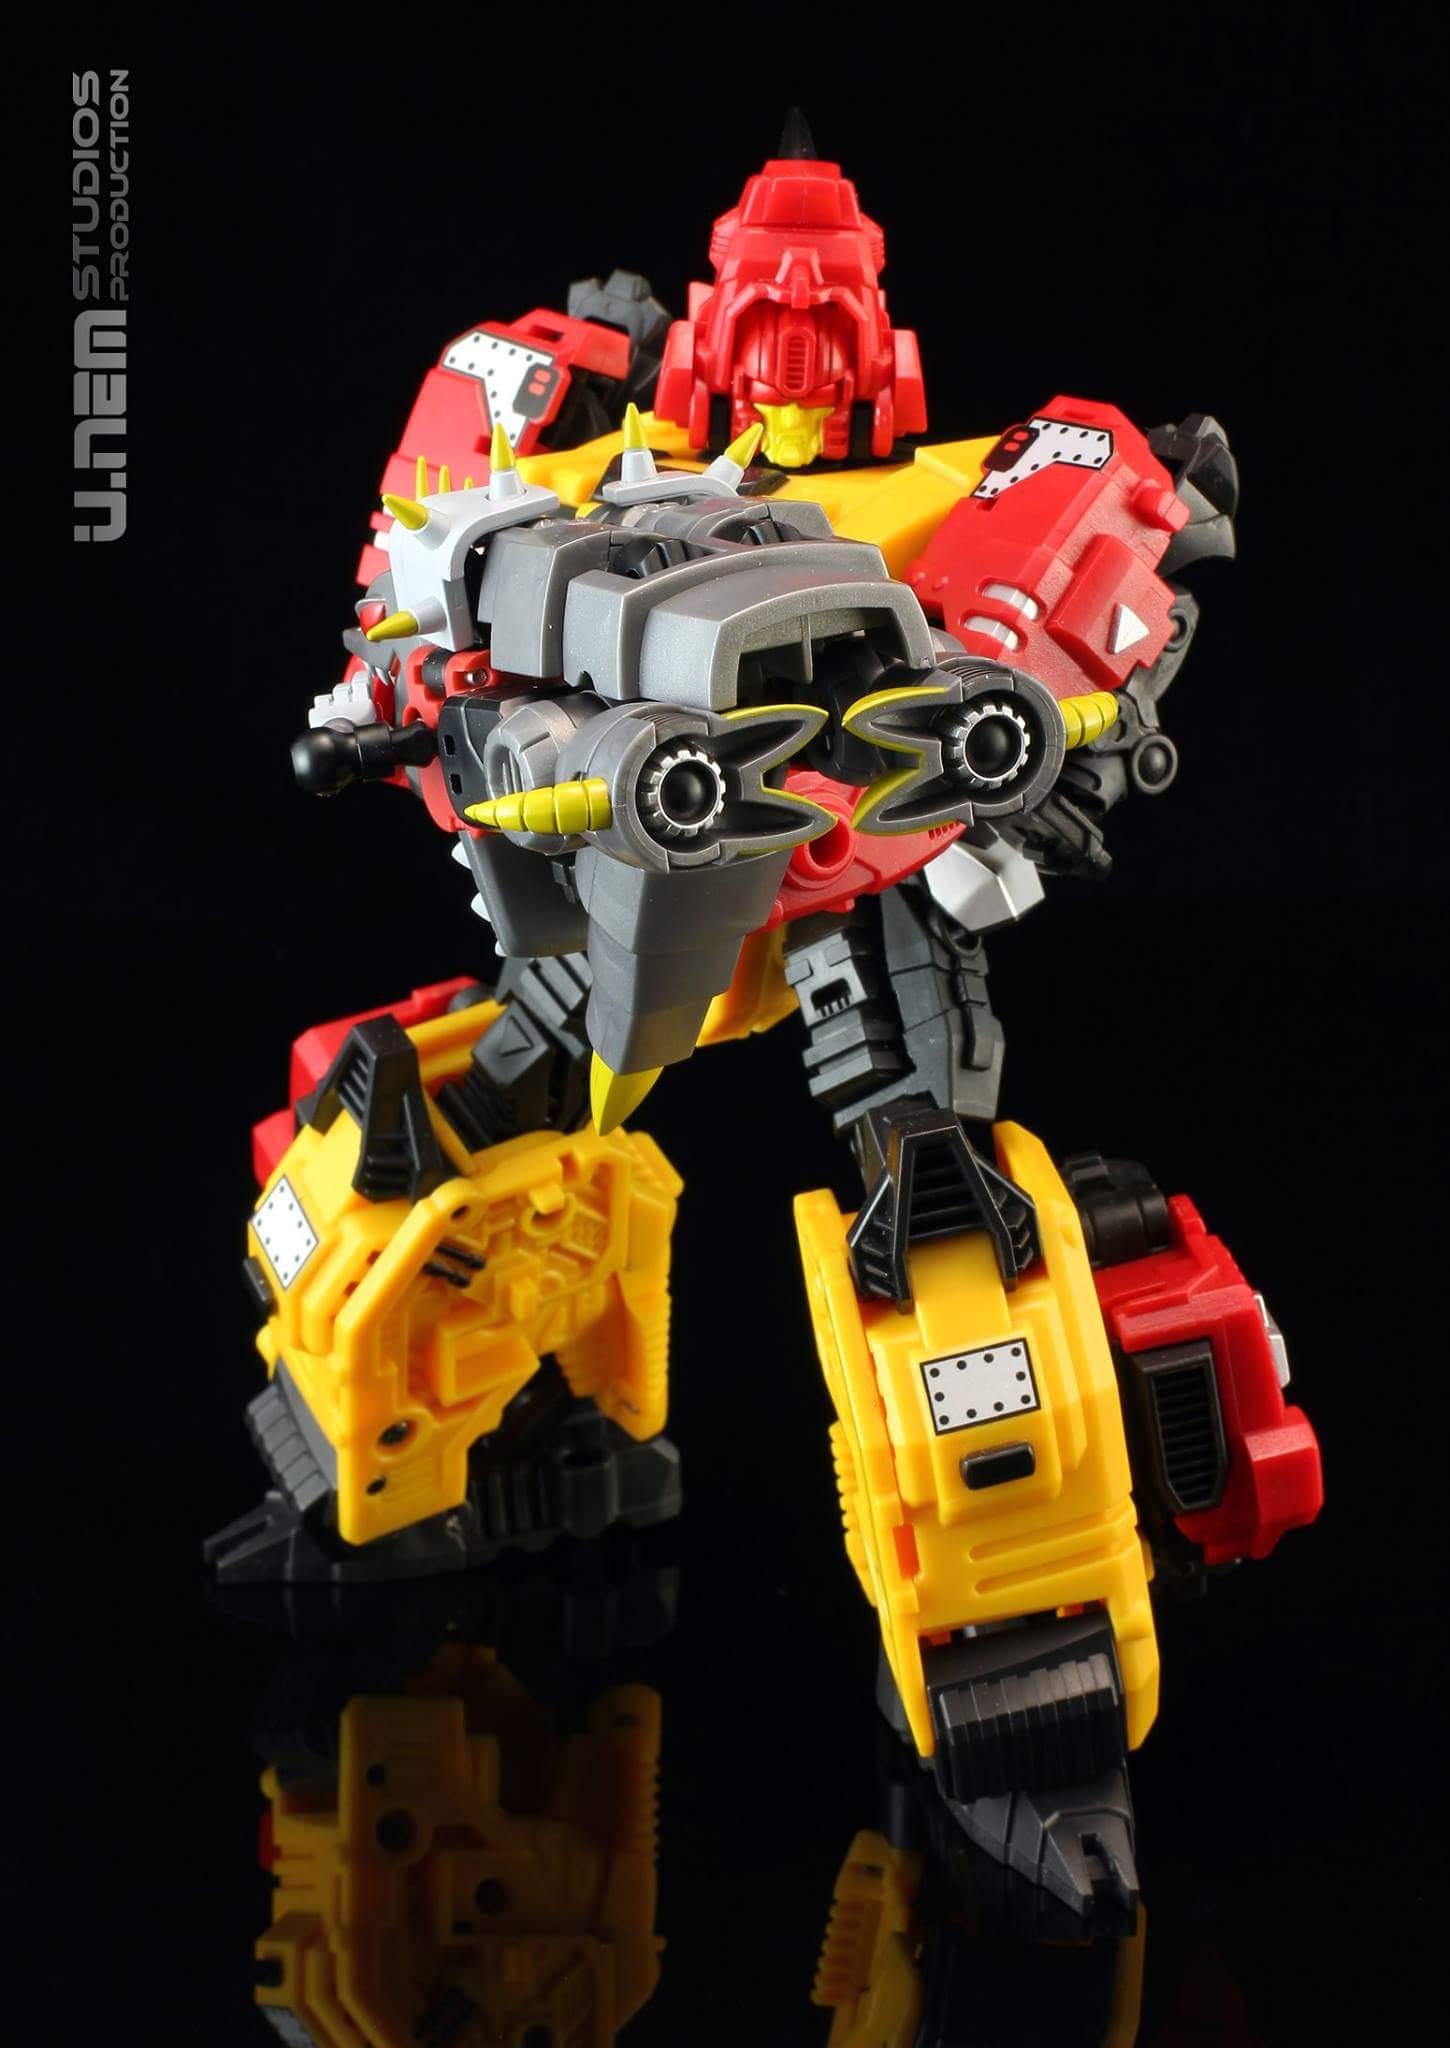 Produit Tiers: [Corbot V] CV-002 Mugger - aka Allicon | [Unique Toys] G-02 Sharky - aka Sharkticon/Requanicon FN8DnBSr